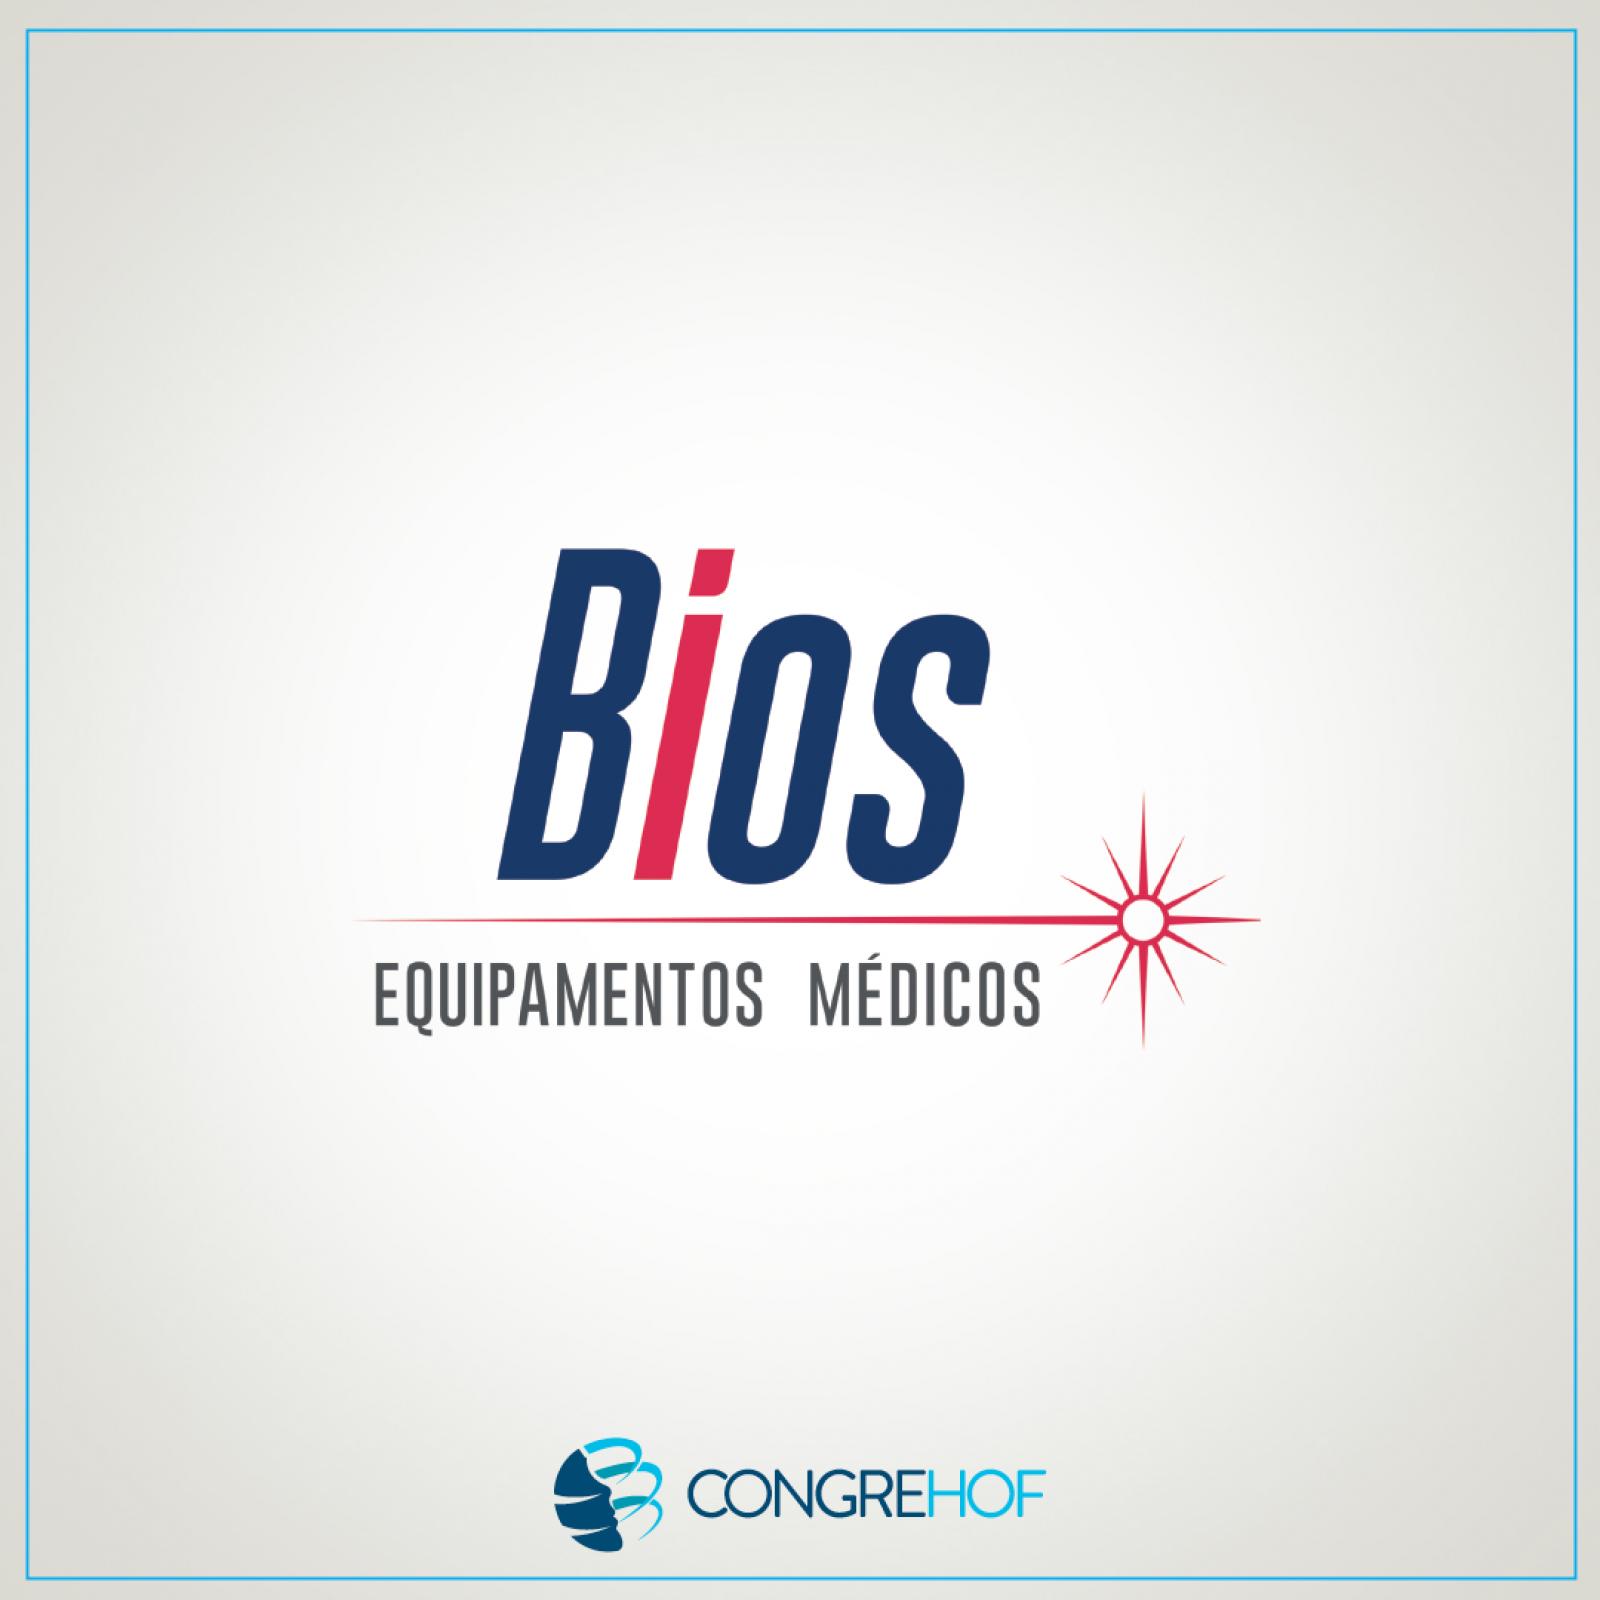 BIOS Equipamentos Médicos